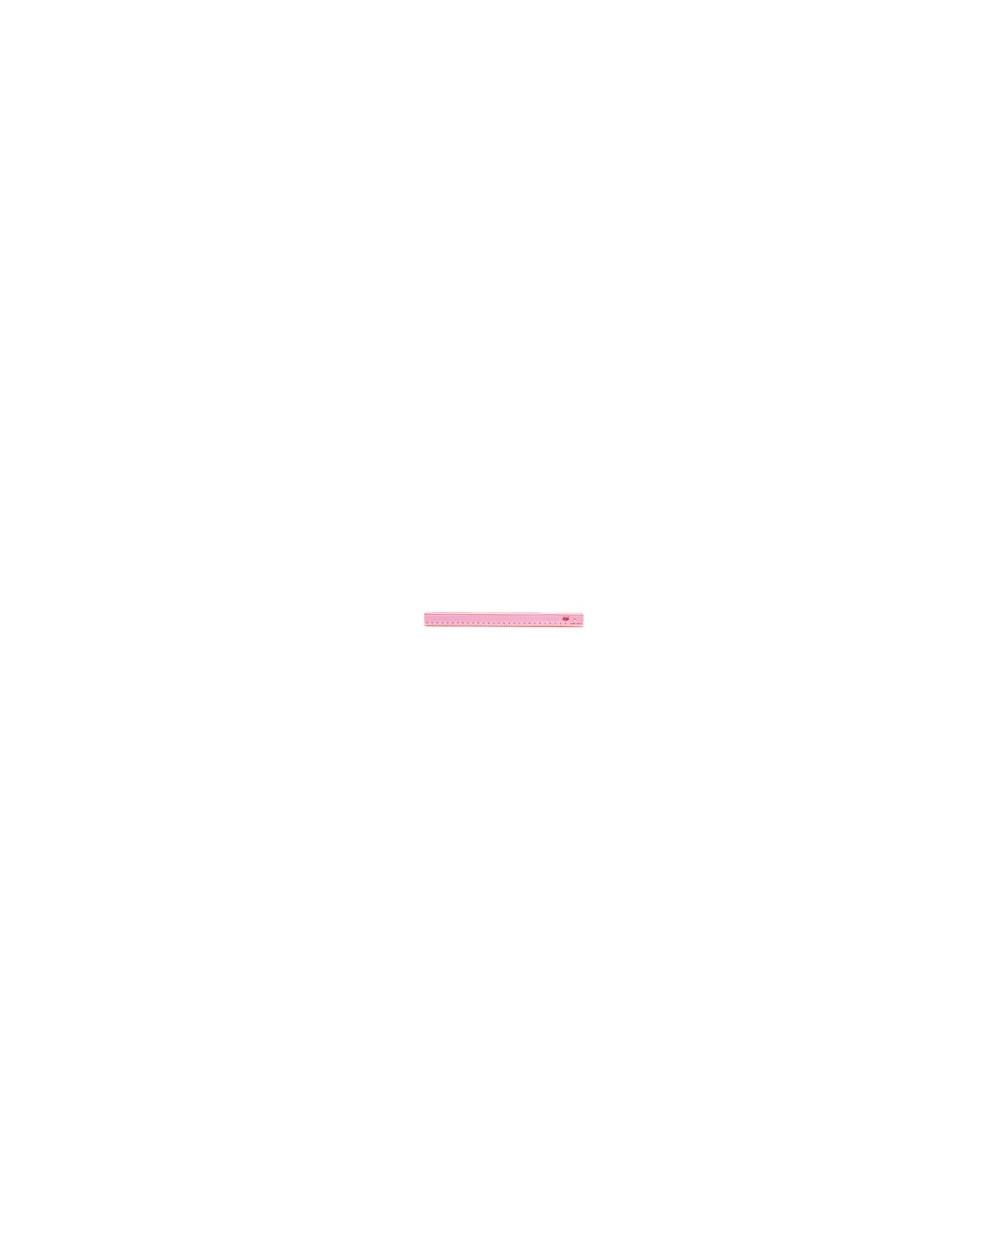 Линия прозрачна HATAS, неон, 30 см, ширина - 27 мм